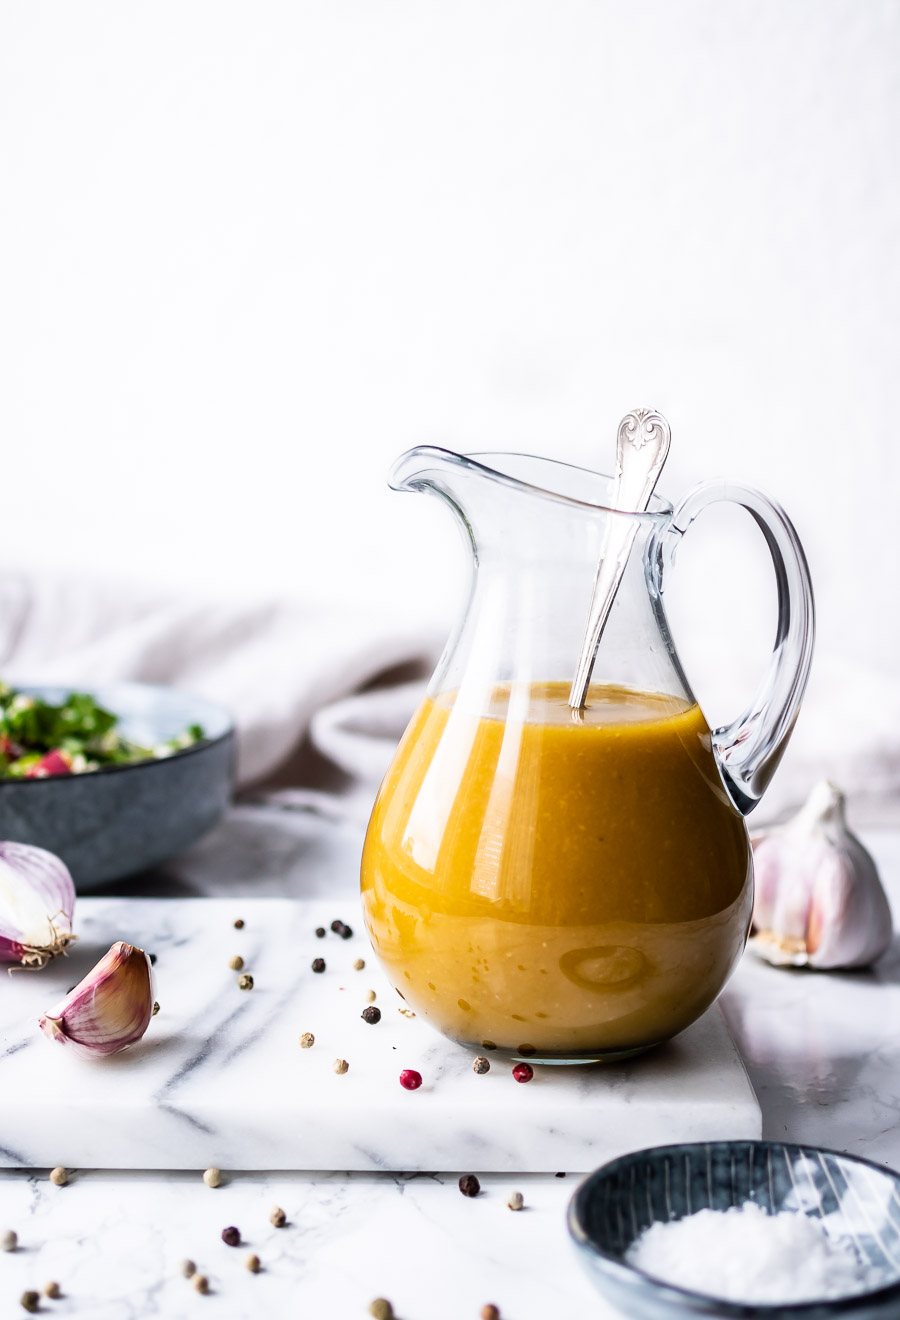 Olie-eddikedressing-salatdressing